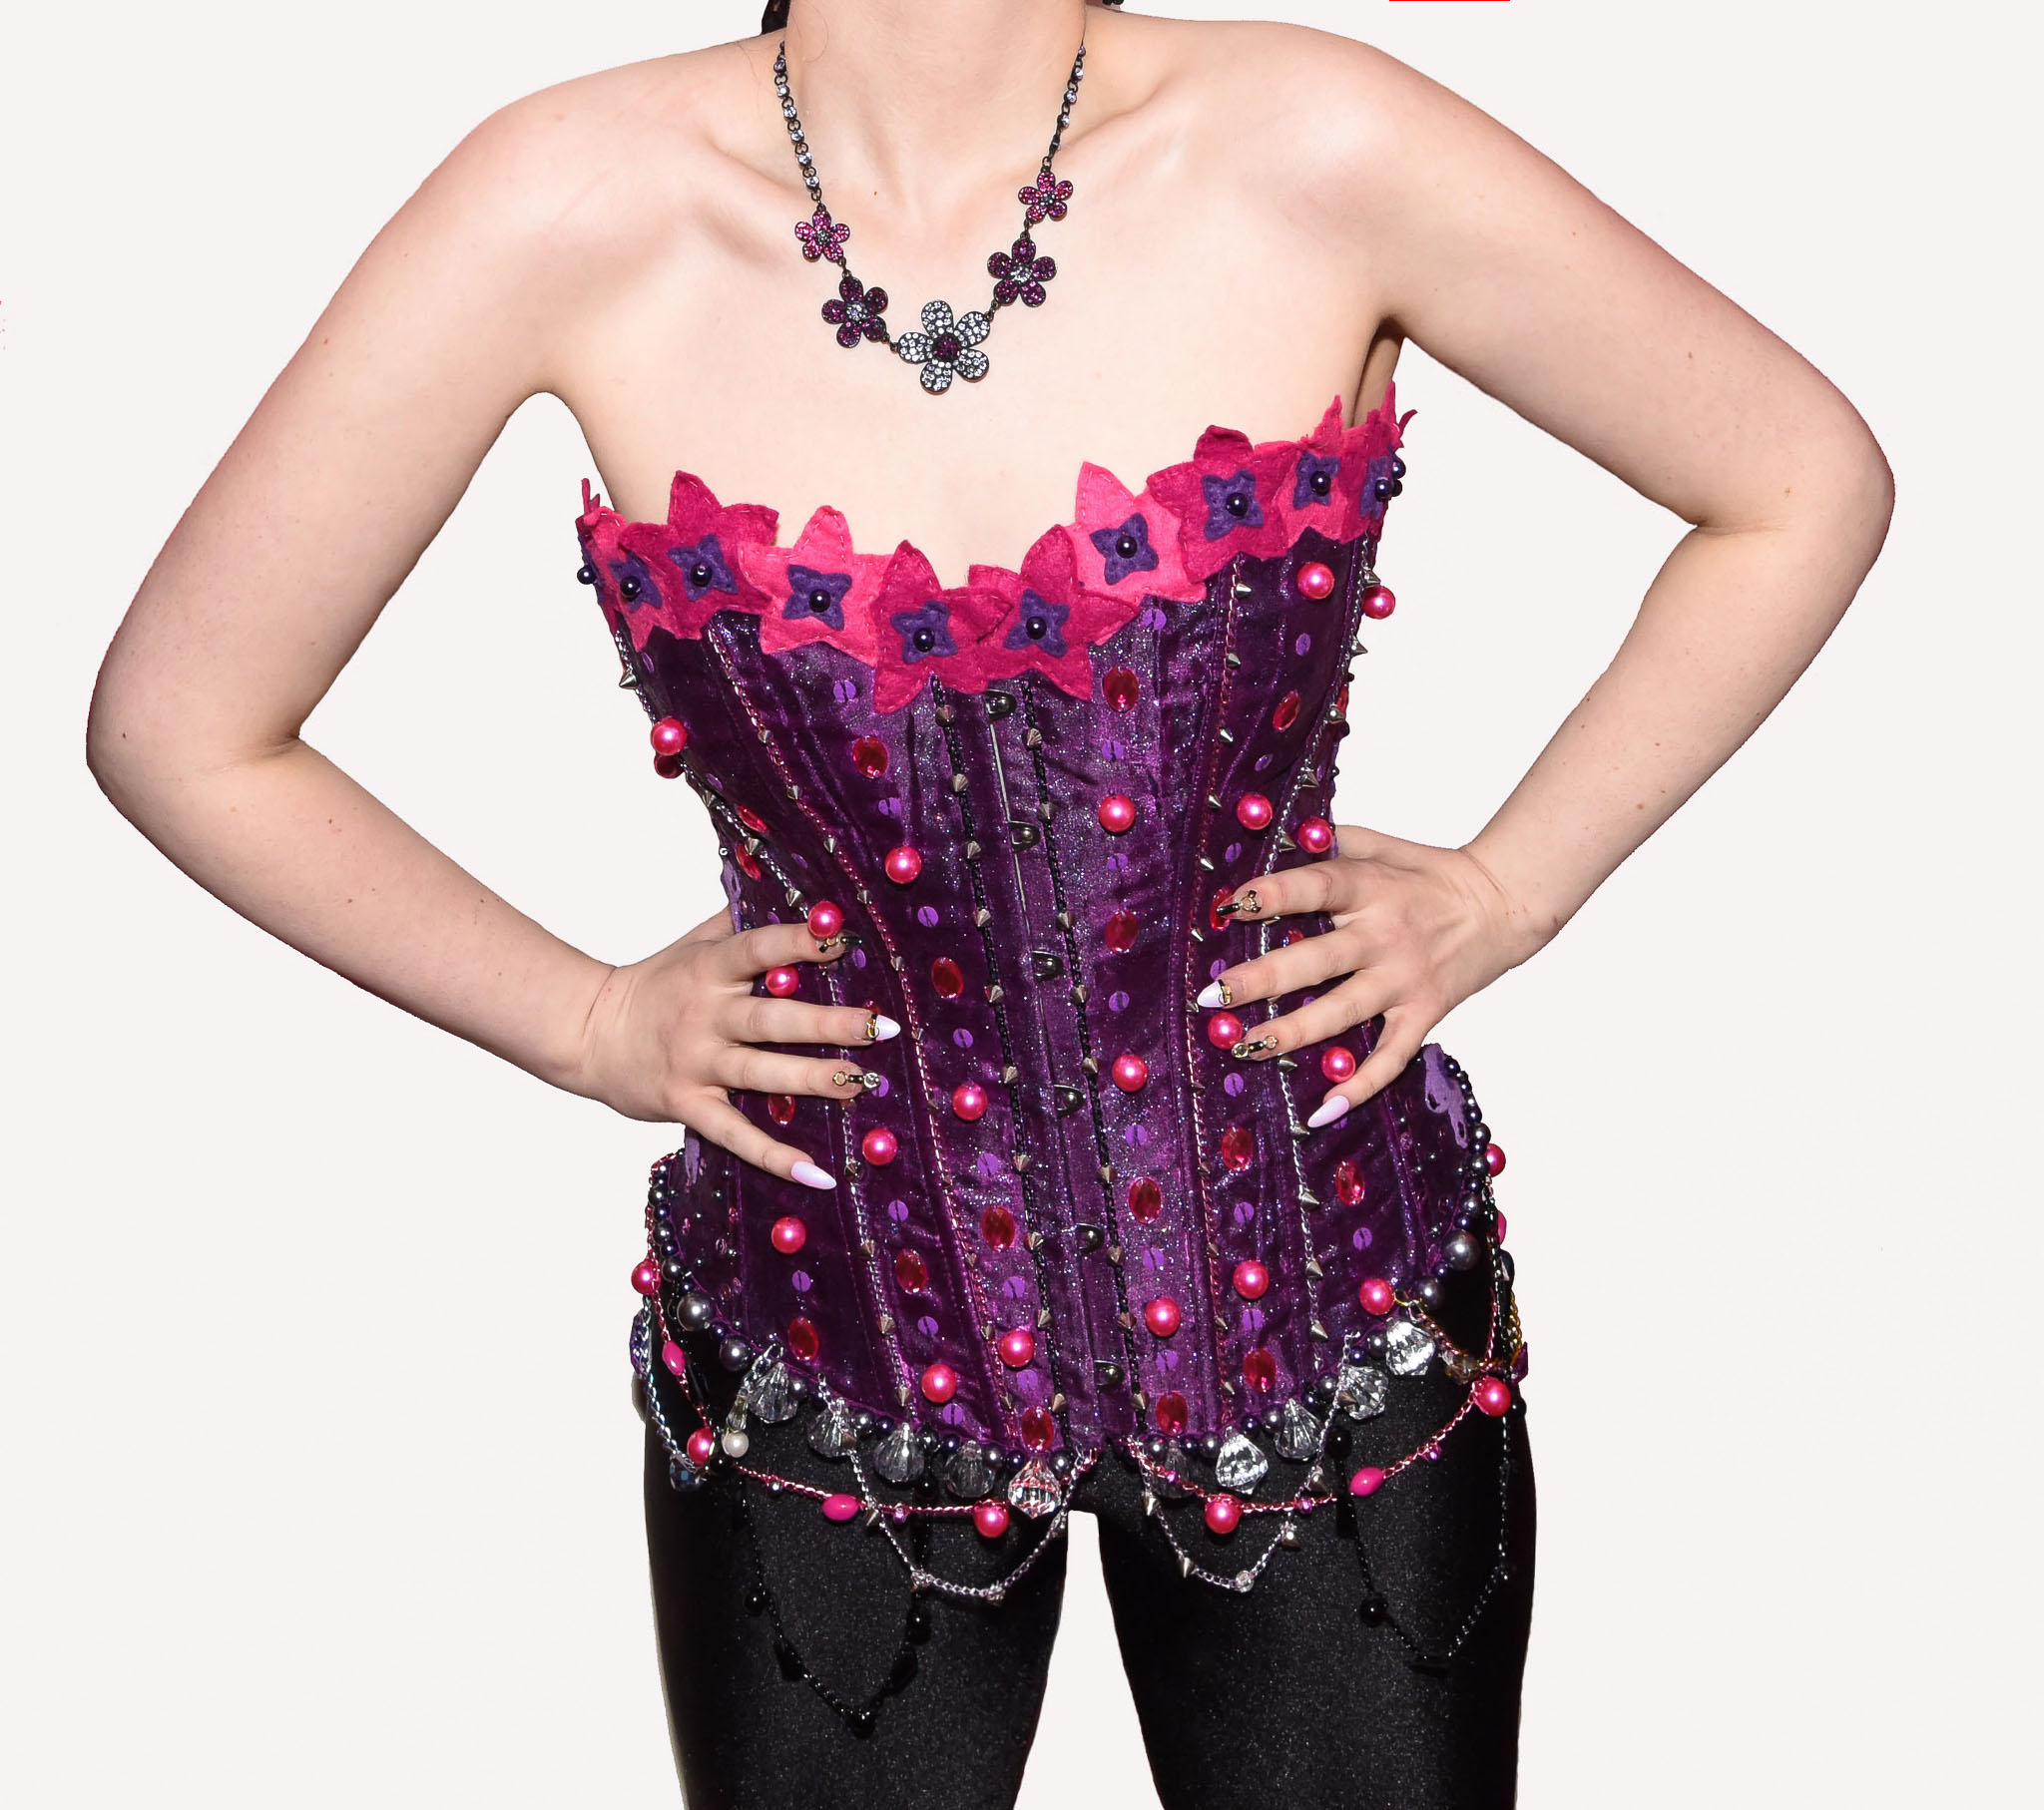 Purple & pink corset